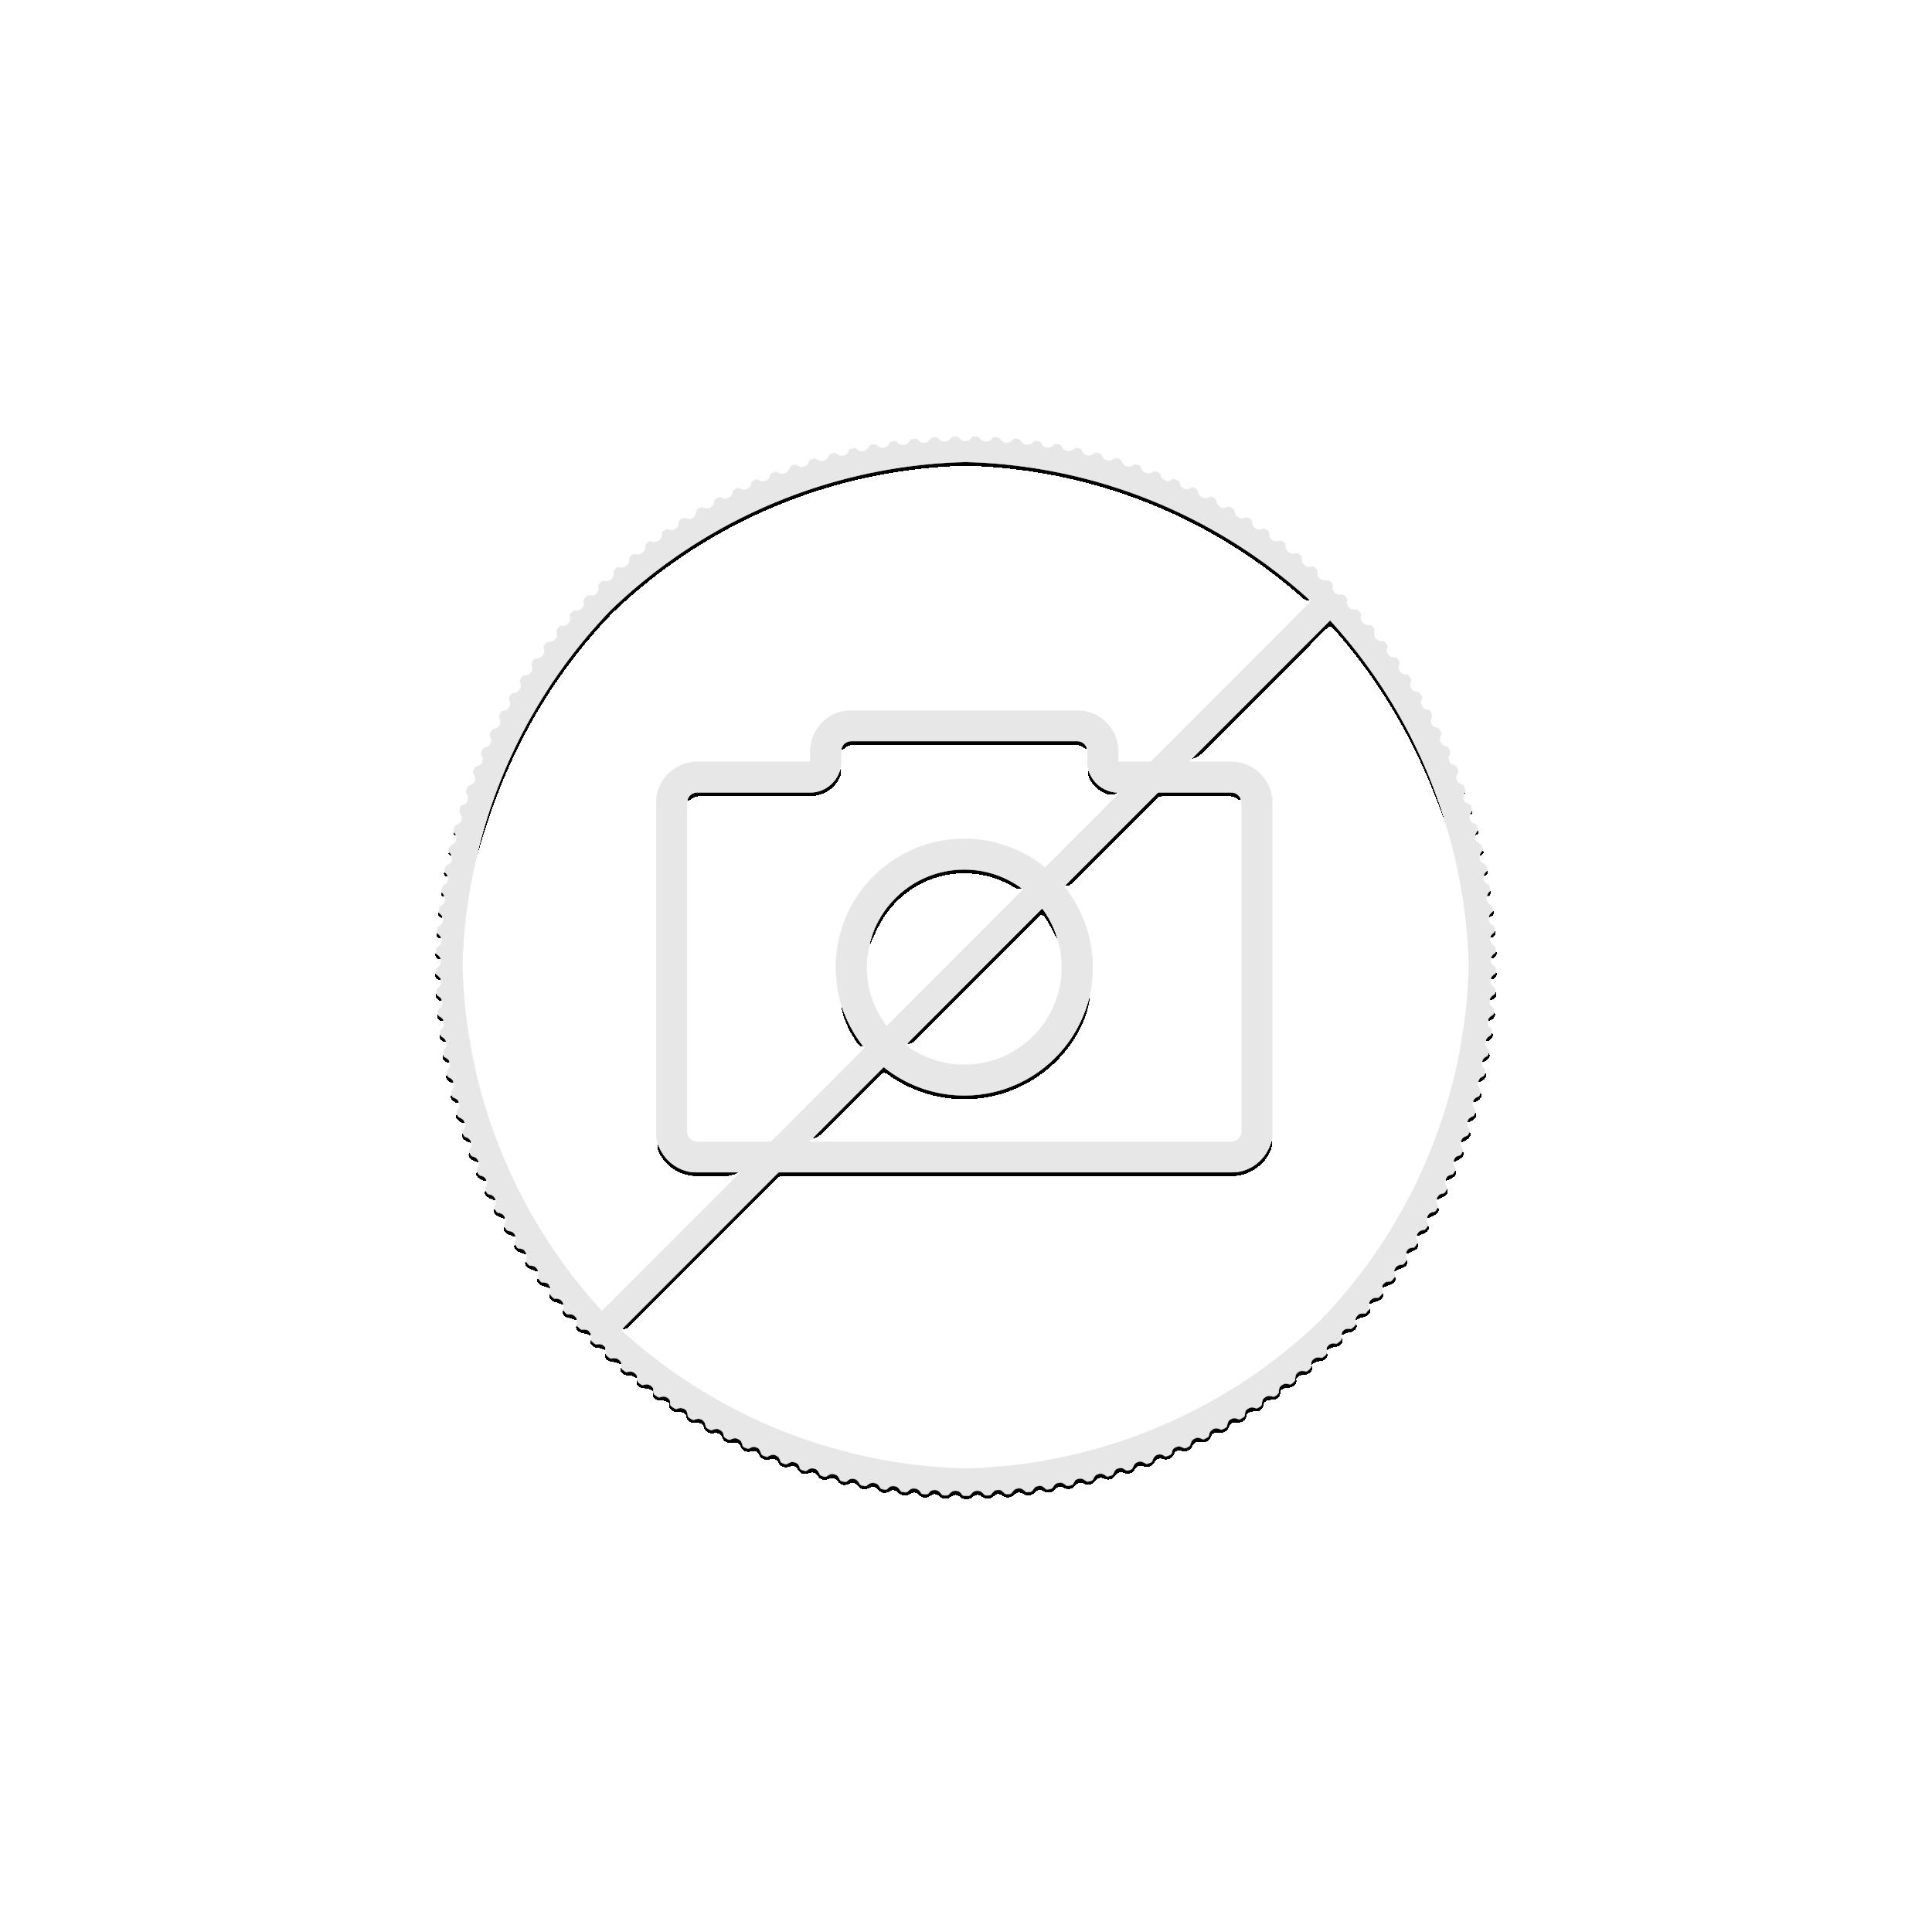 1 troy ounce silver coin Kangaroo 2019